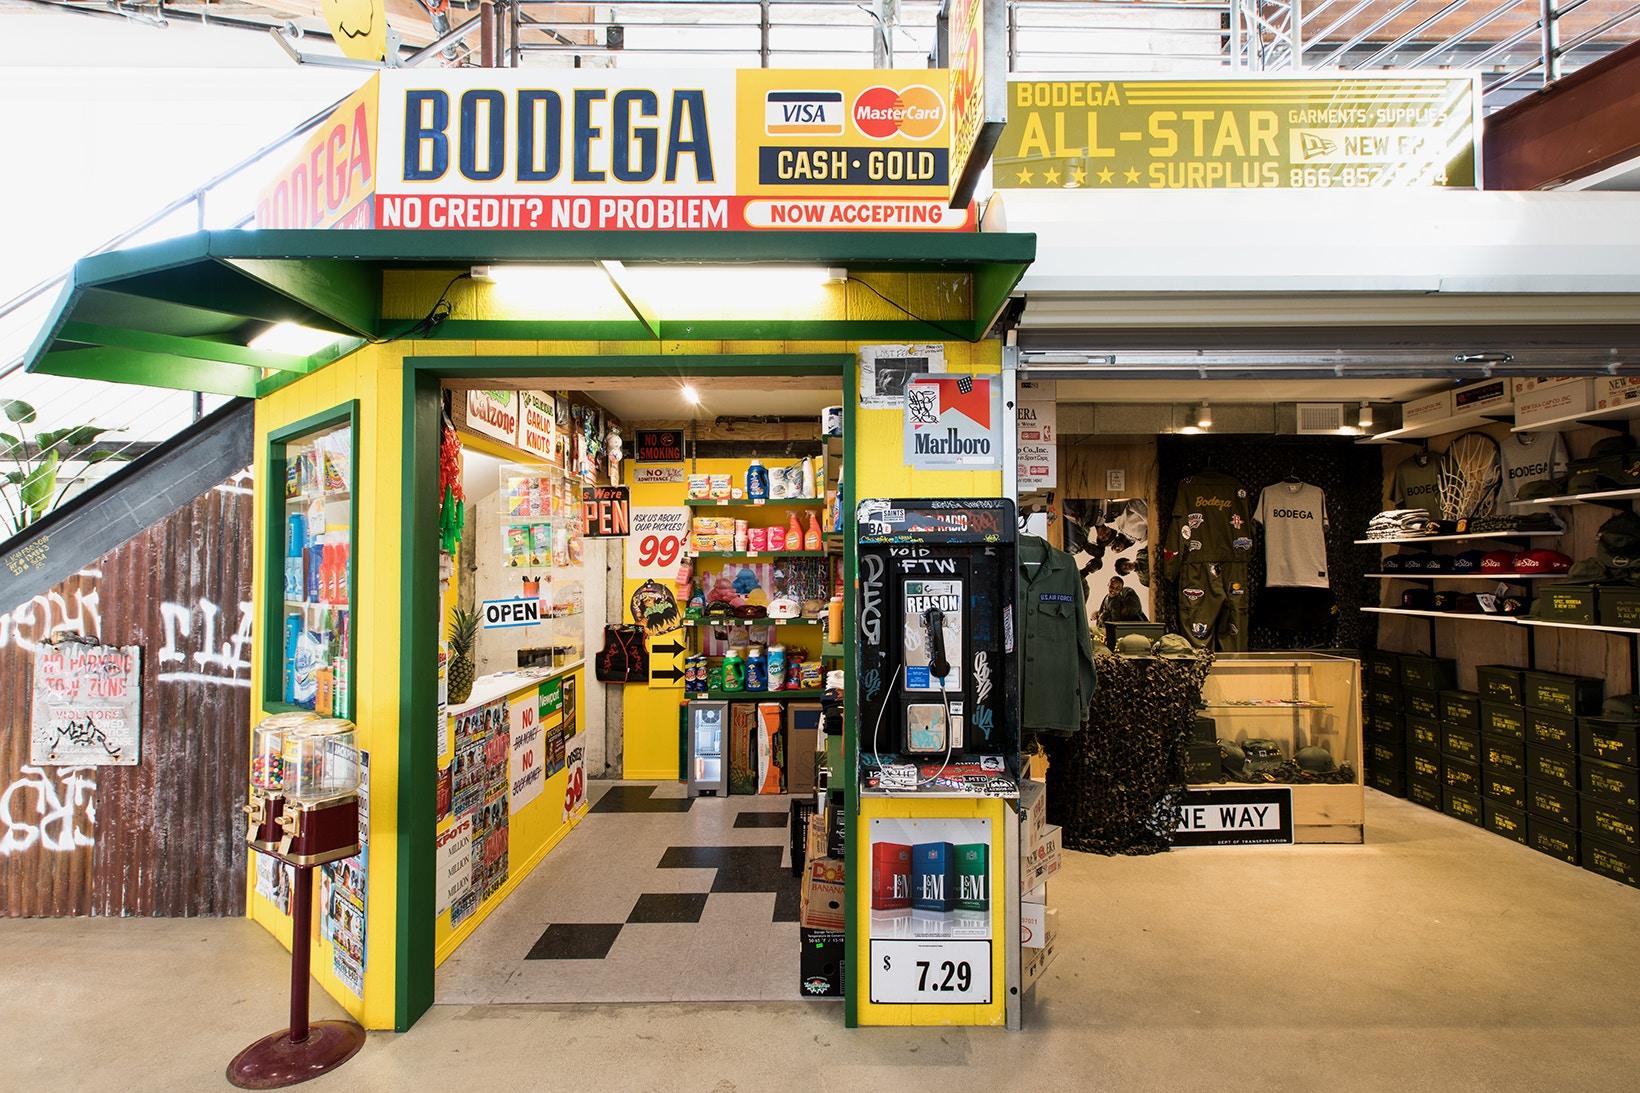 bodega-los-angeles-new-store-1.jpg